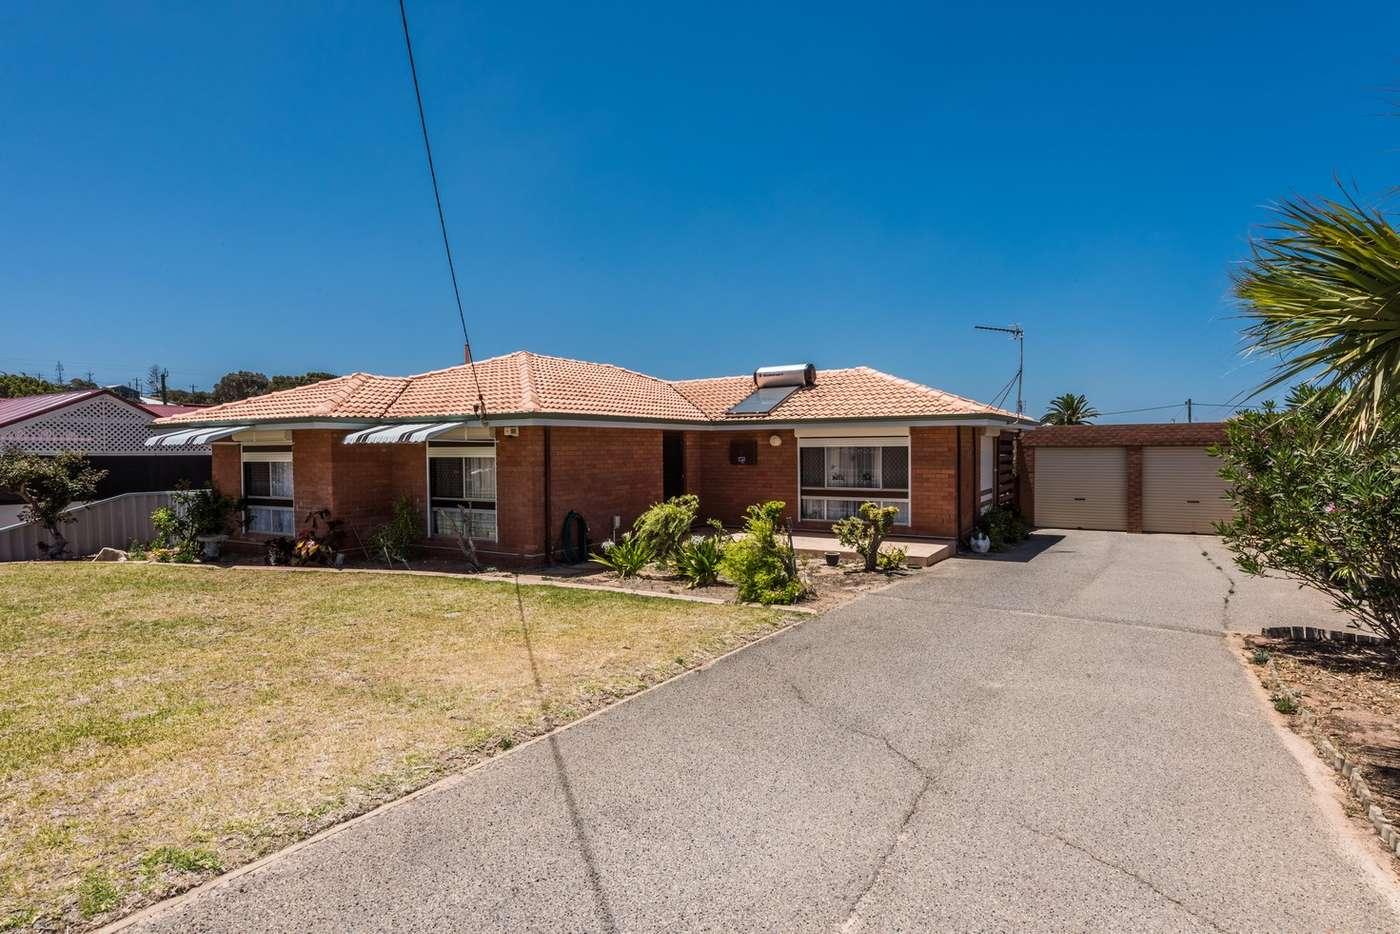 Main view of Homely house listing, 7 Glendinning Road, Tarcoola Beach WA 6530